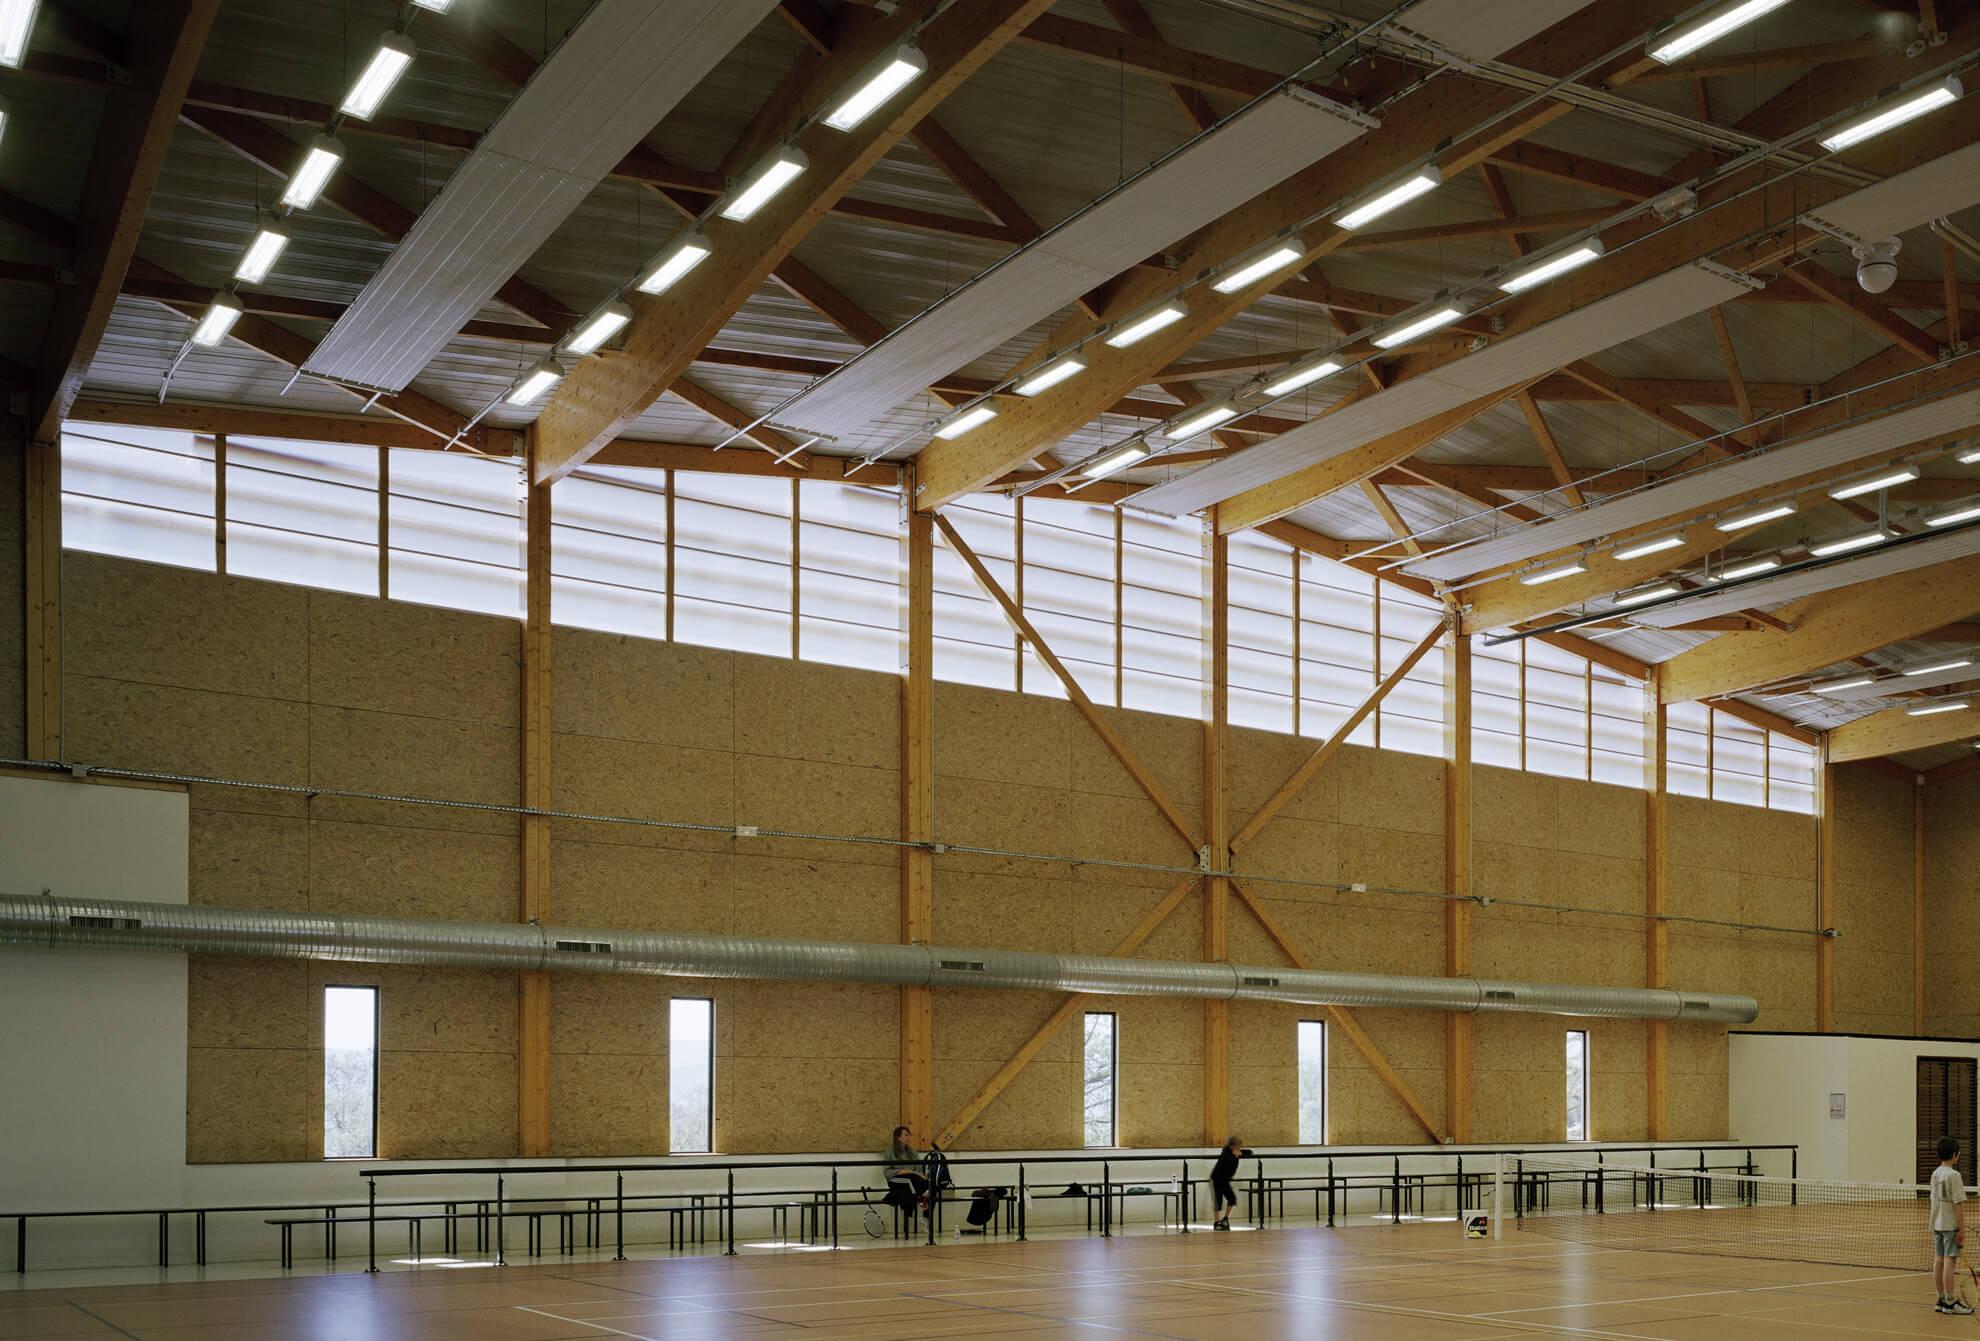 Salle de sport St Maurice sur dargoire